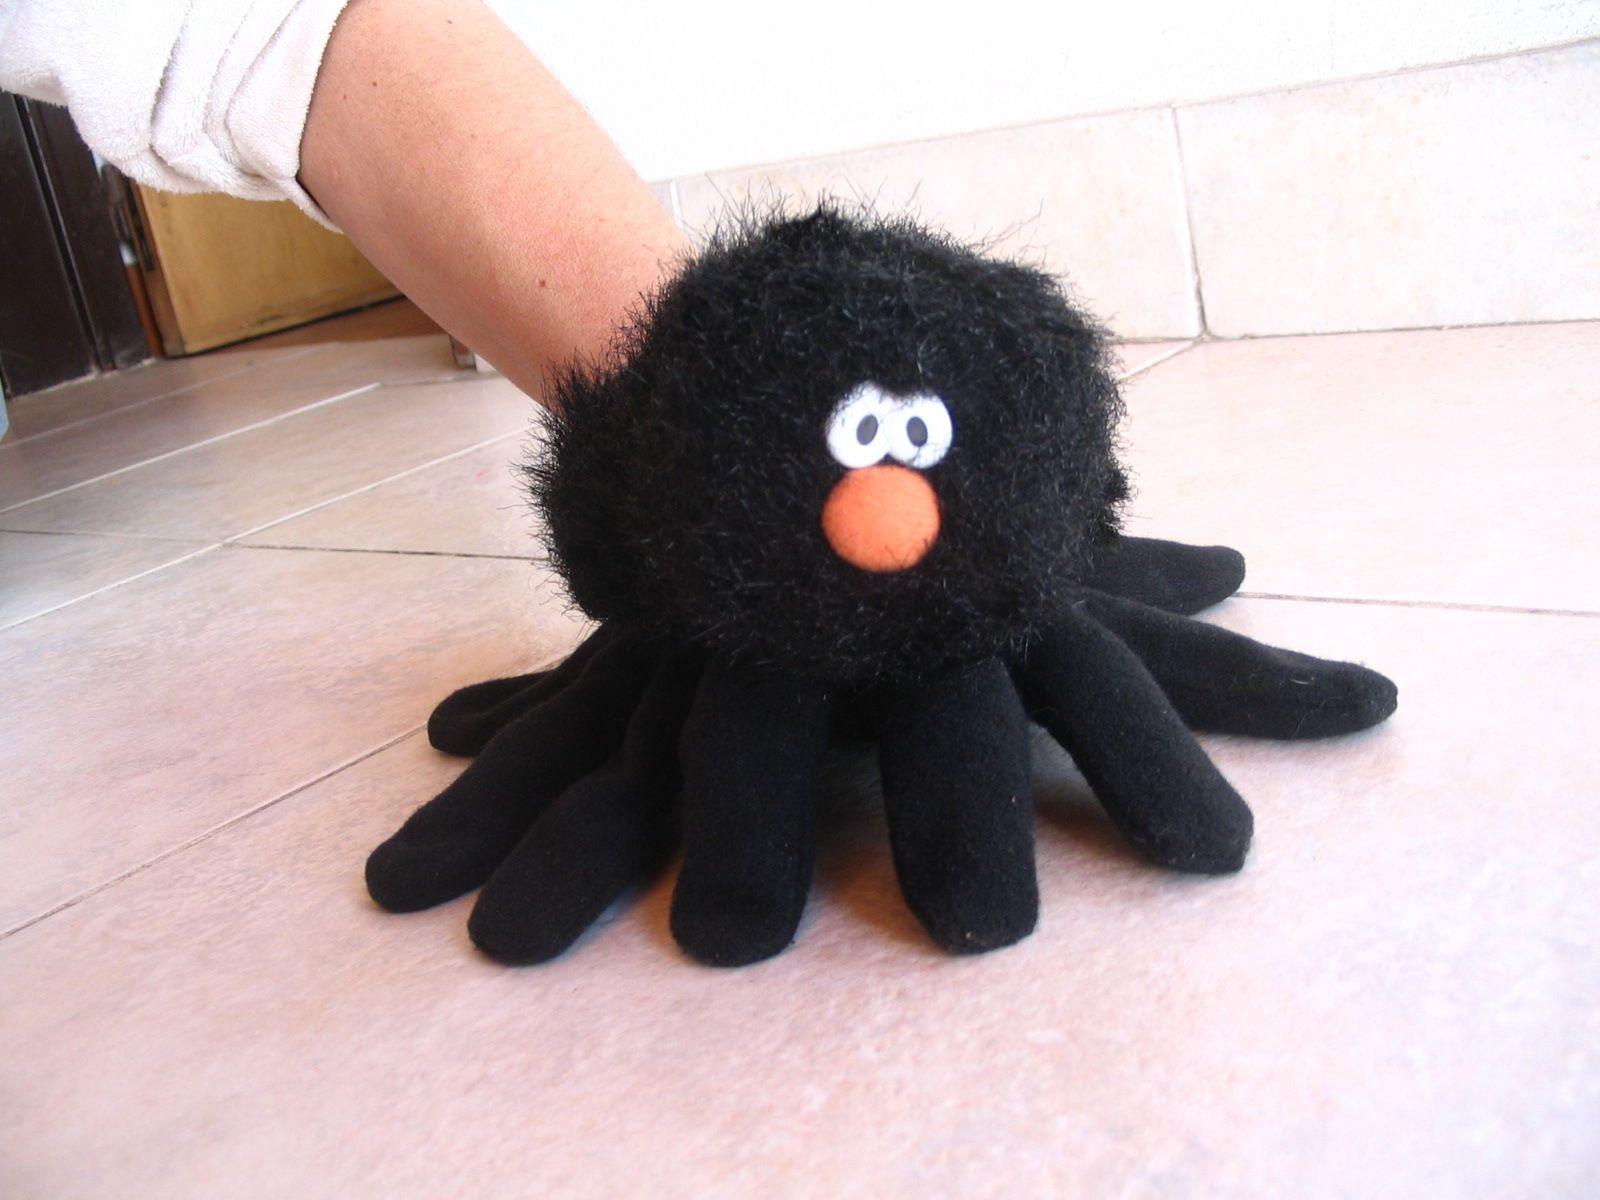 Titere guante t teres pinterest guantes marioneta y - Como hacer talon de calcetines de lana ...